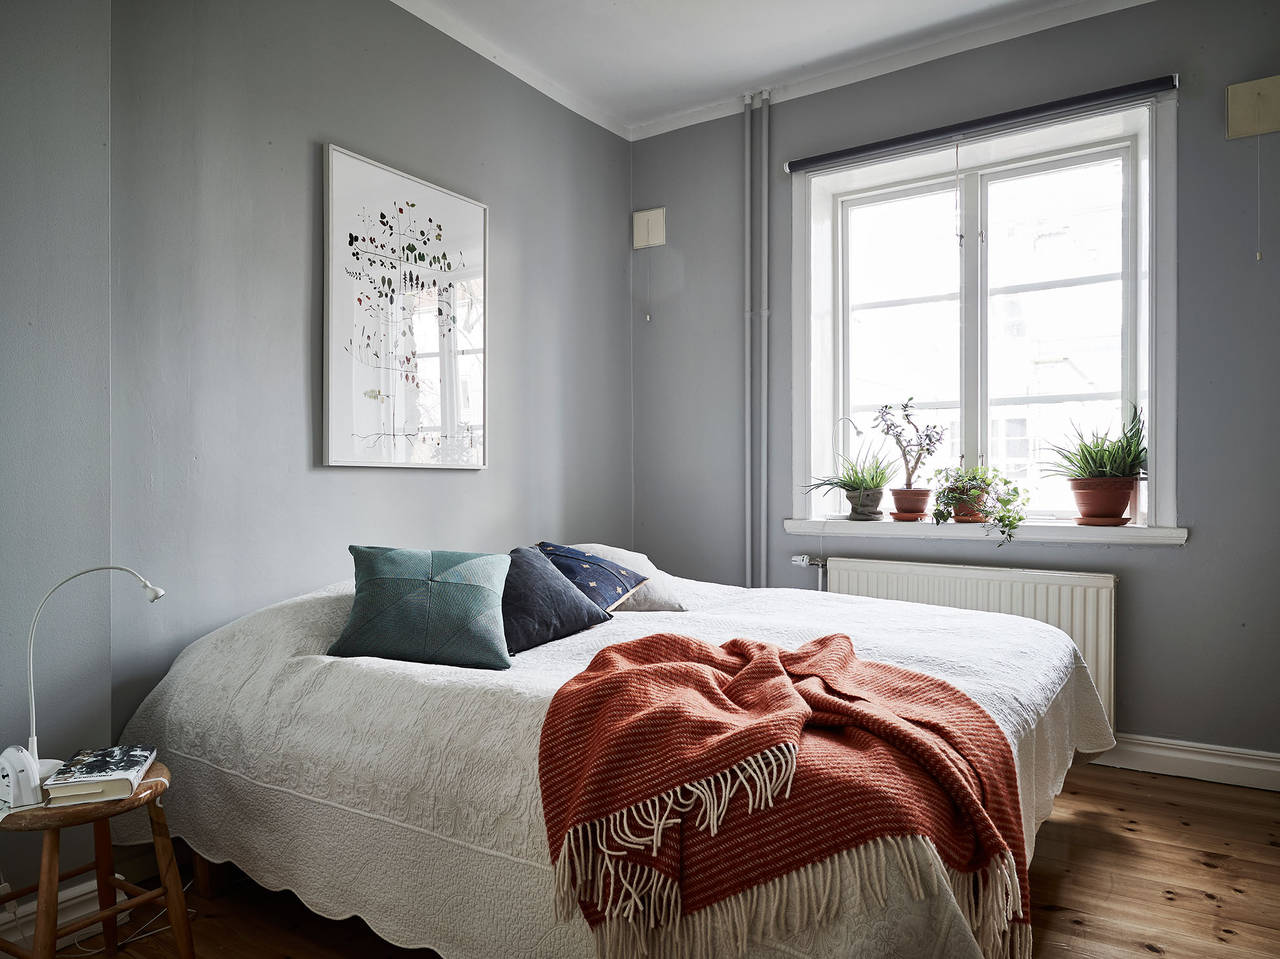 New Dreamy Ikea Bathroom Daily Dream Decor: A Dreamy & Cozy Scandi Home